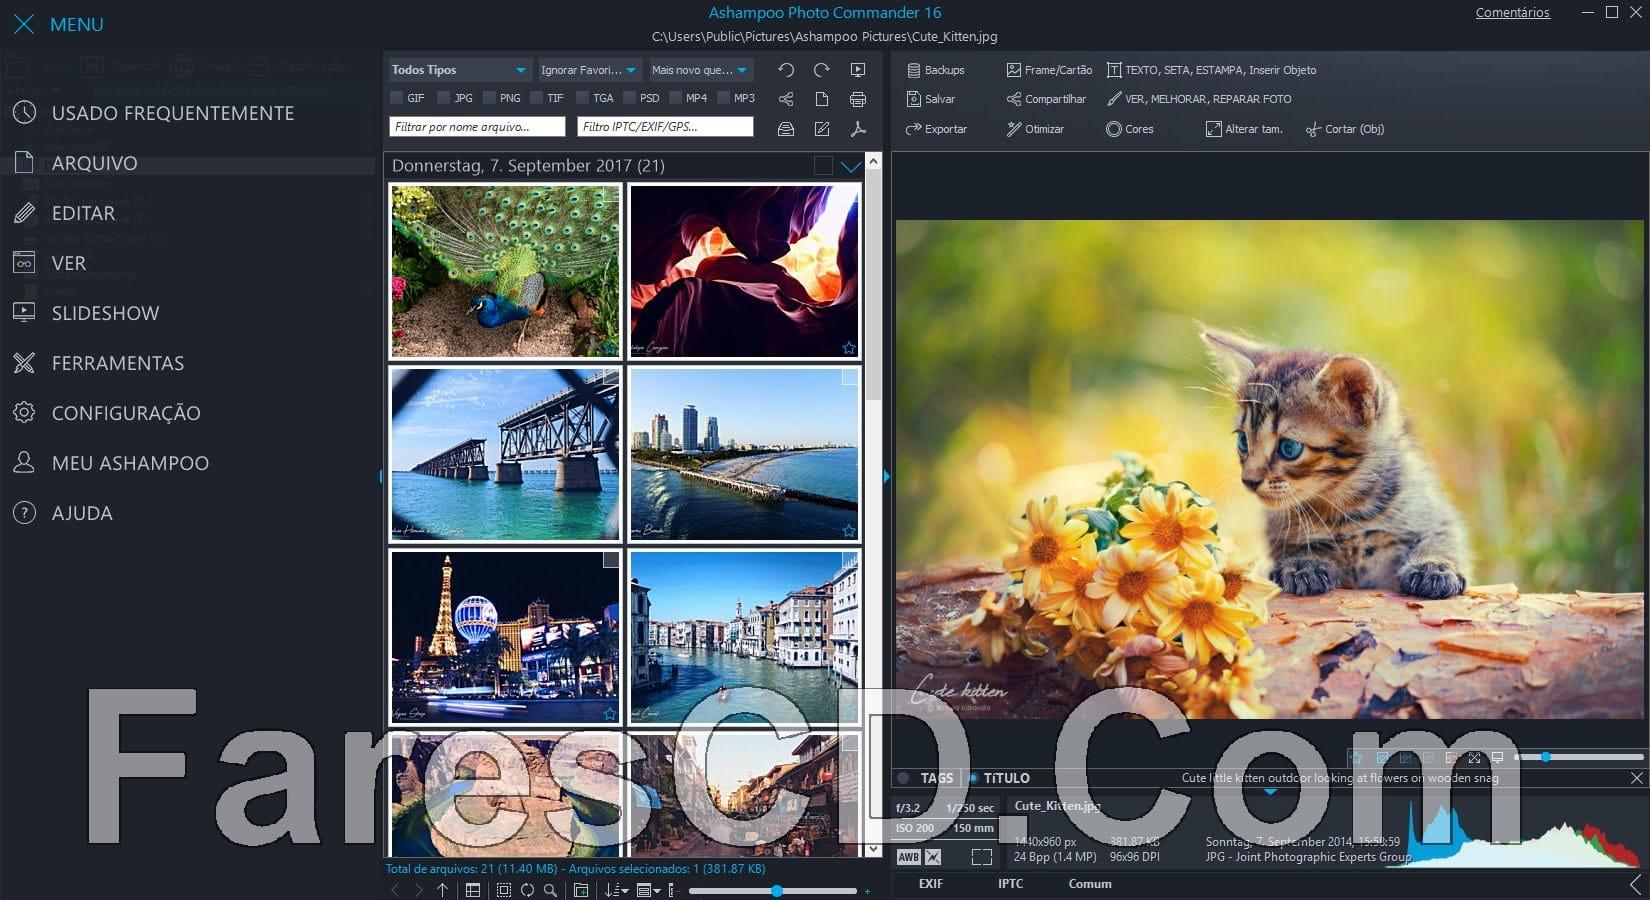 برنامج أشامبو لتعديل الصور   Ashampoo Photo Commander 16.0.1